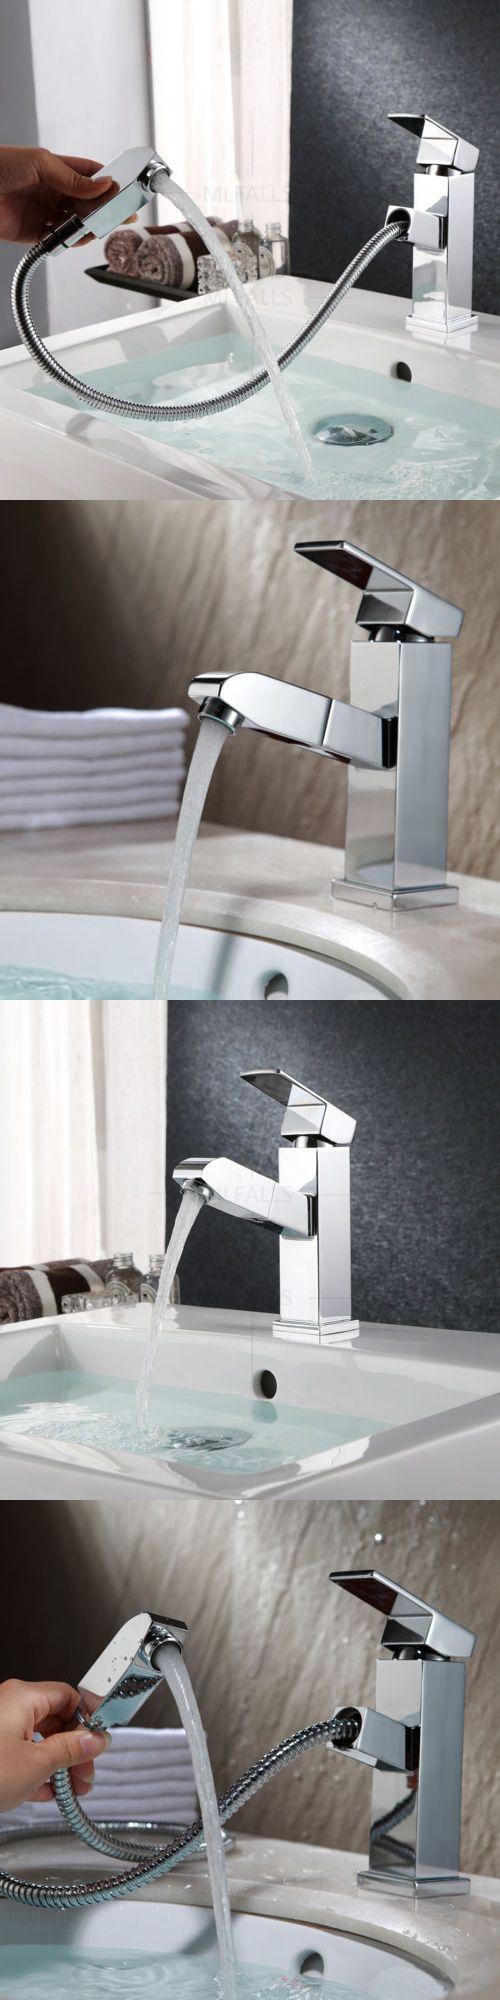 Bathroom sink faucet one hole double handle basin mixer tap ebay - Faucets 42024 Bathroom Basin Sink Faucet Pull Out Spray Single Handle Mixer Tap Contemporary